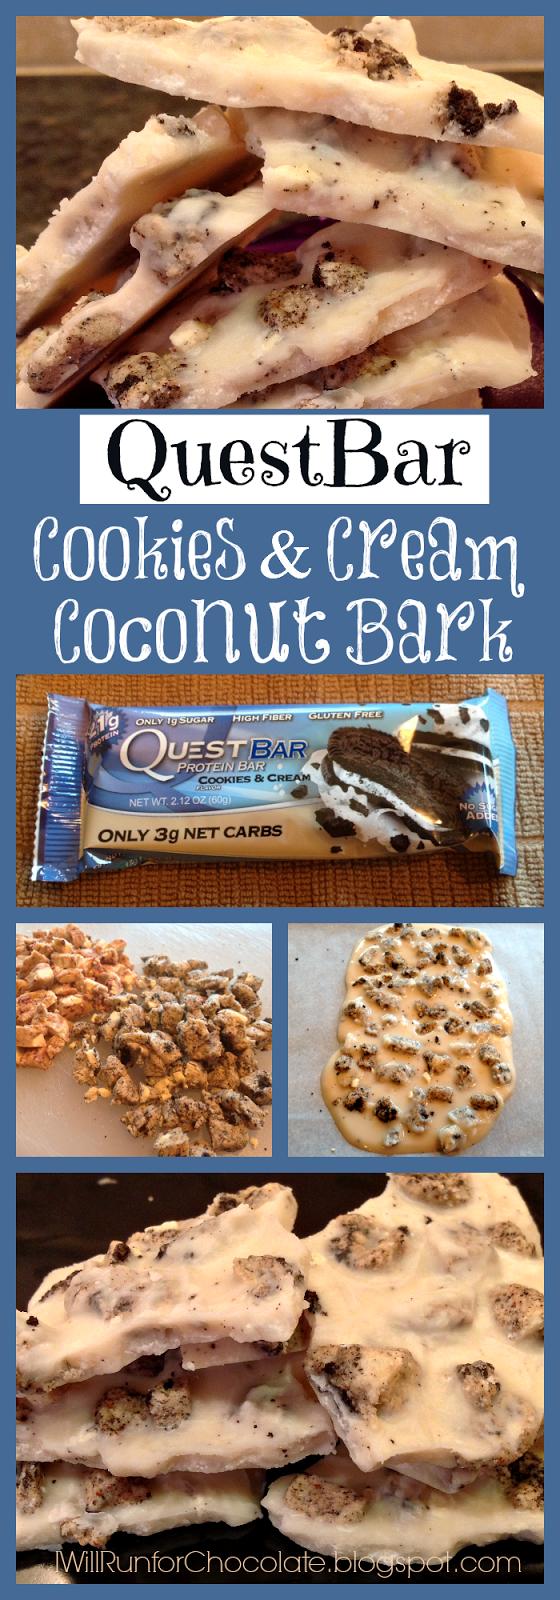 Quest Bar Cookies and Cream Coconut Bark Recipe